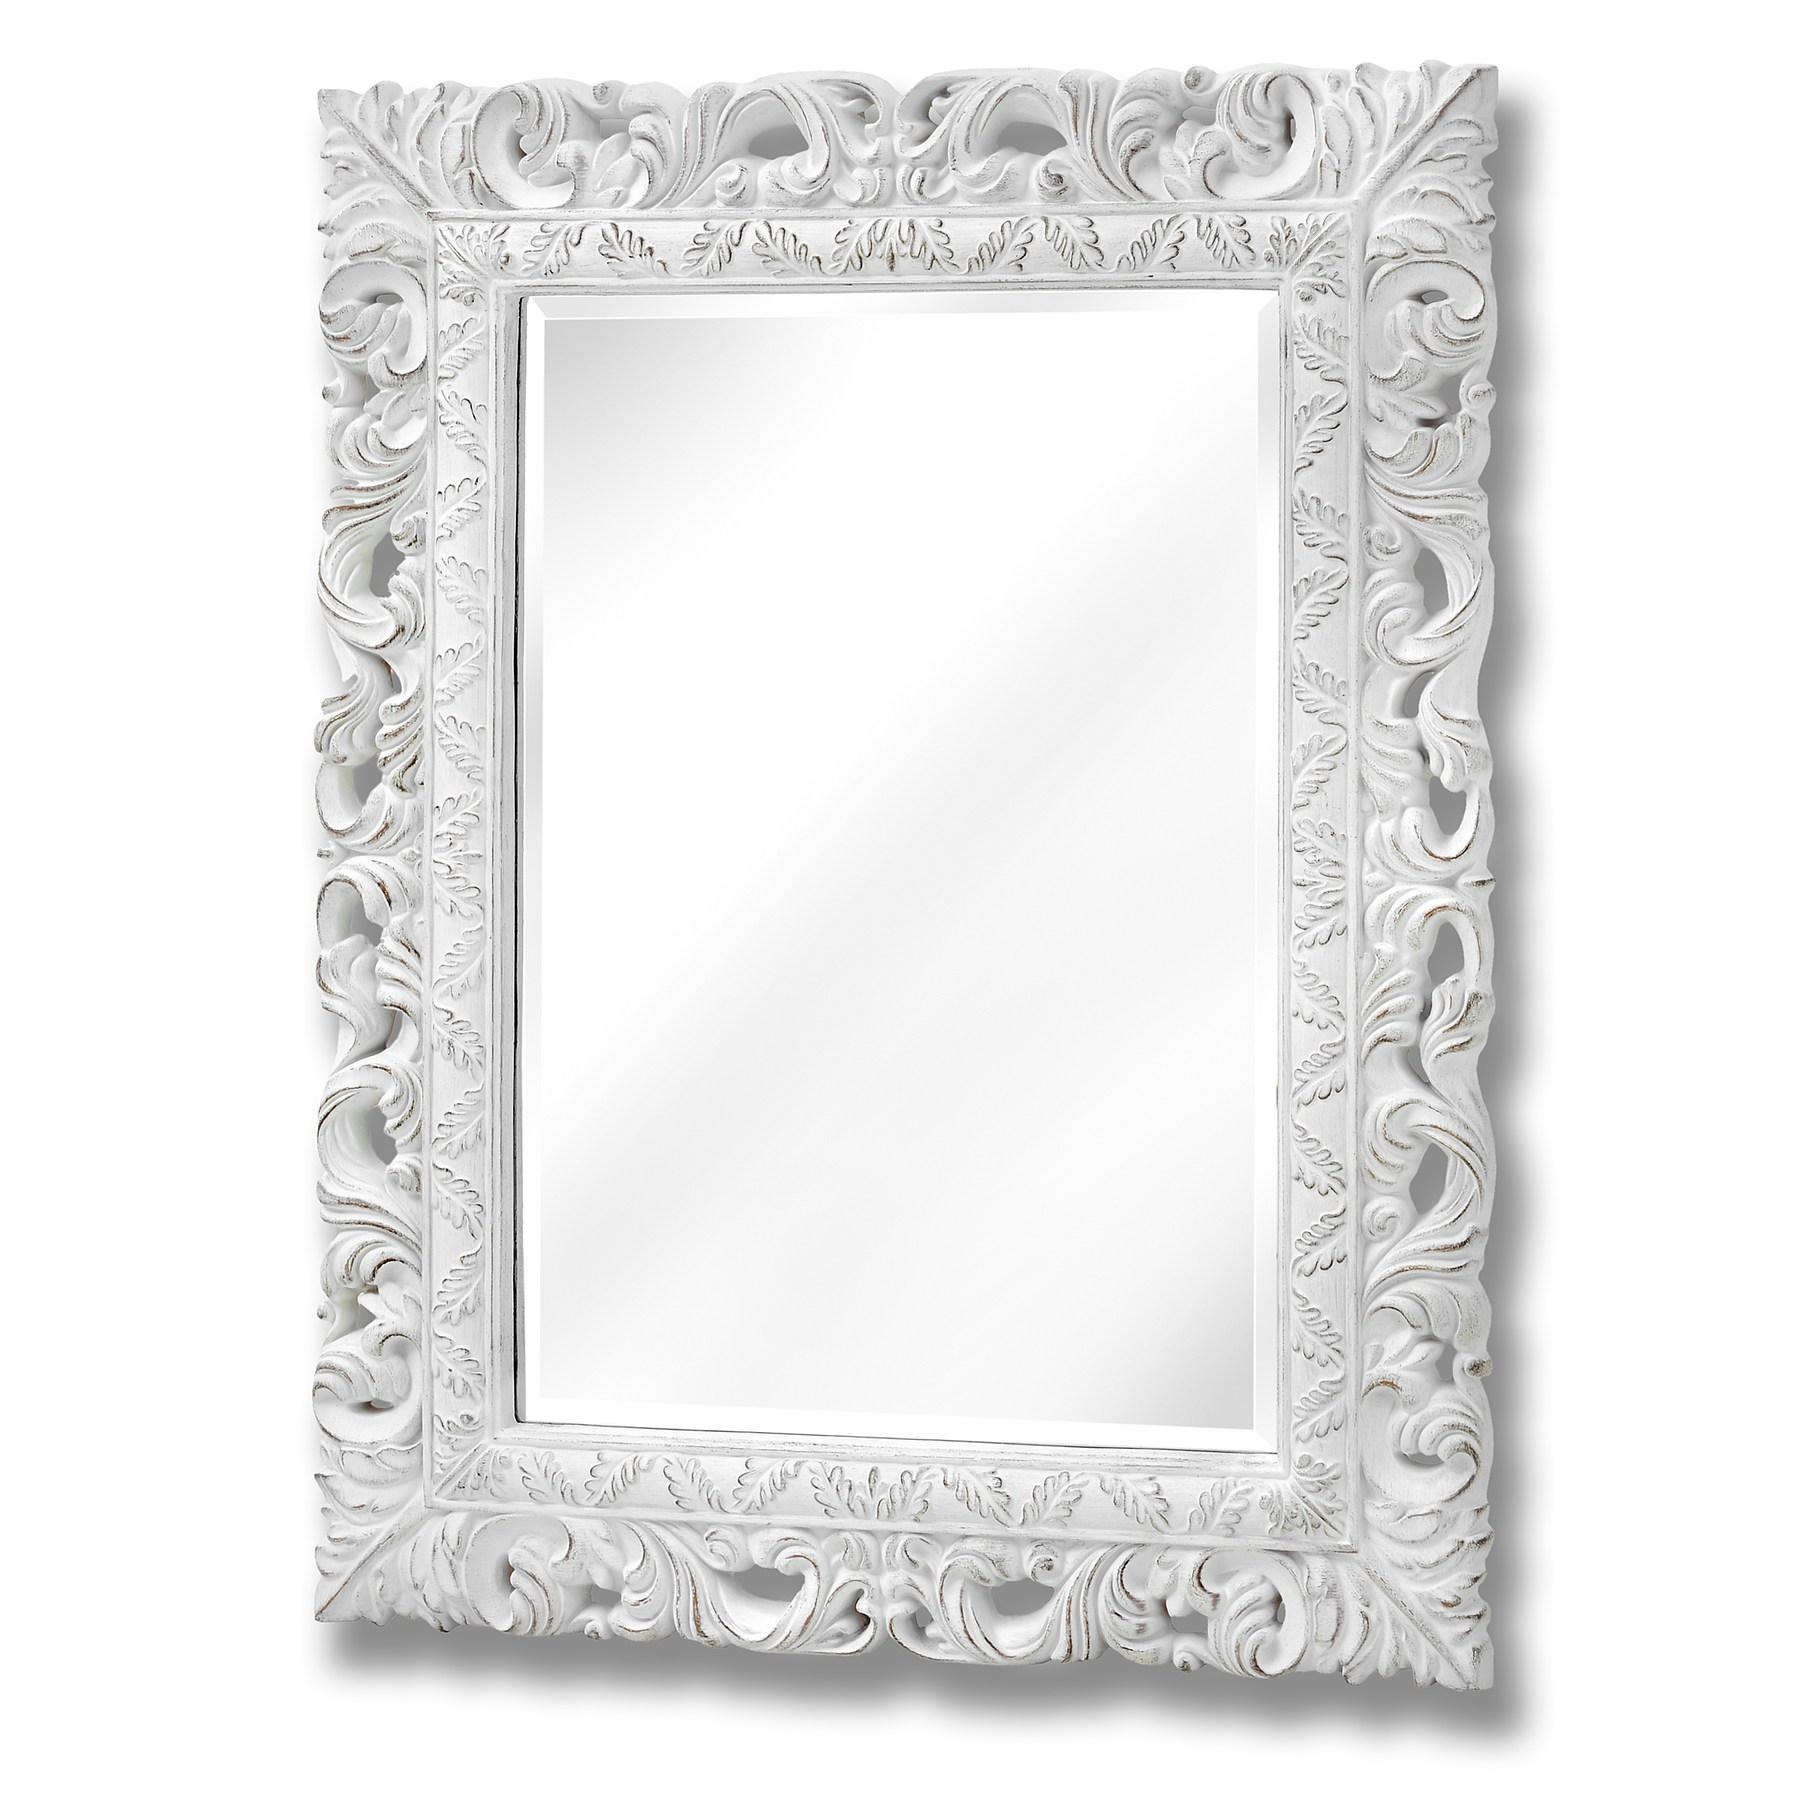 Antique White Ornate Leaf Wall Mirror – Arijacks Regarding Antique Wall Mirror (Image 9 of 20)